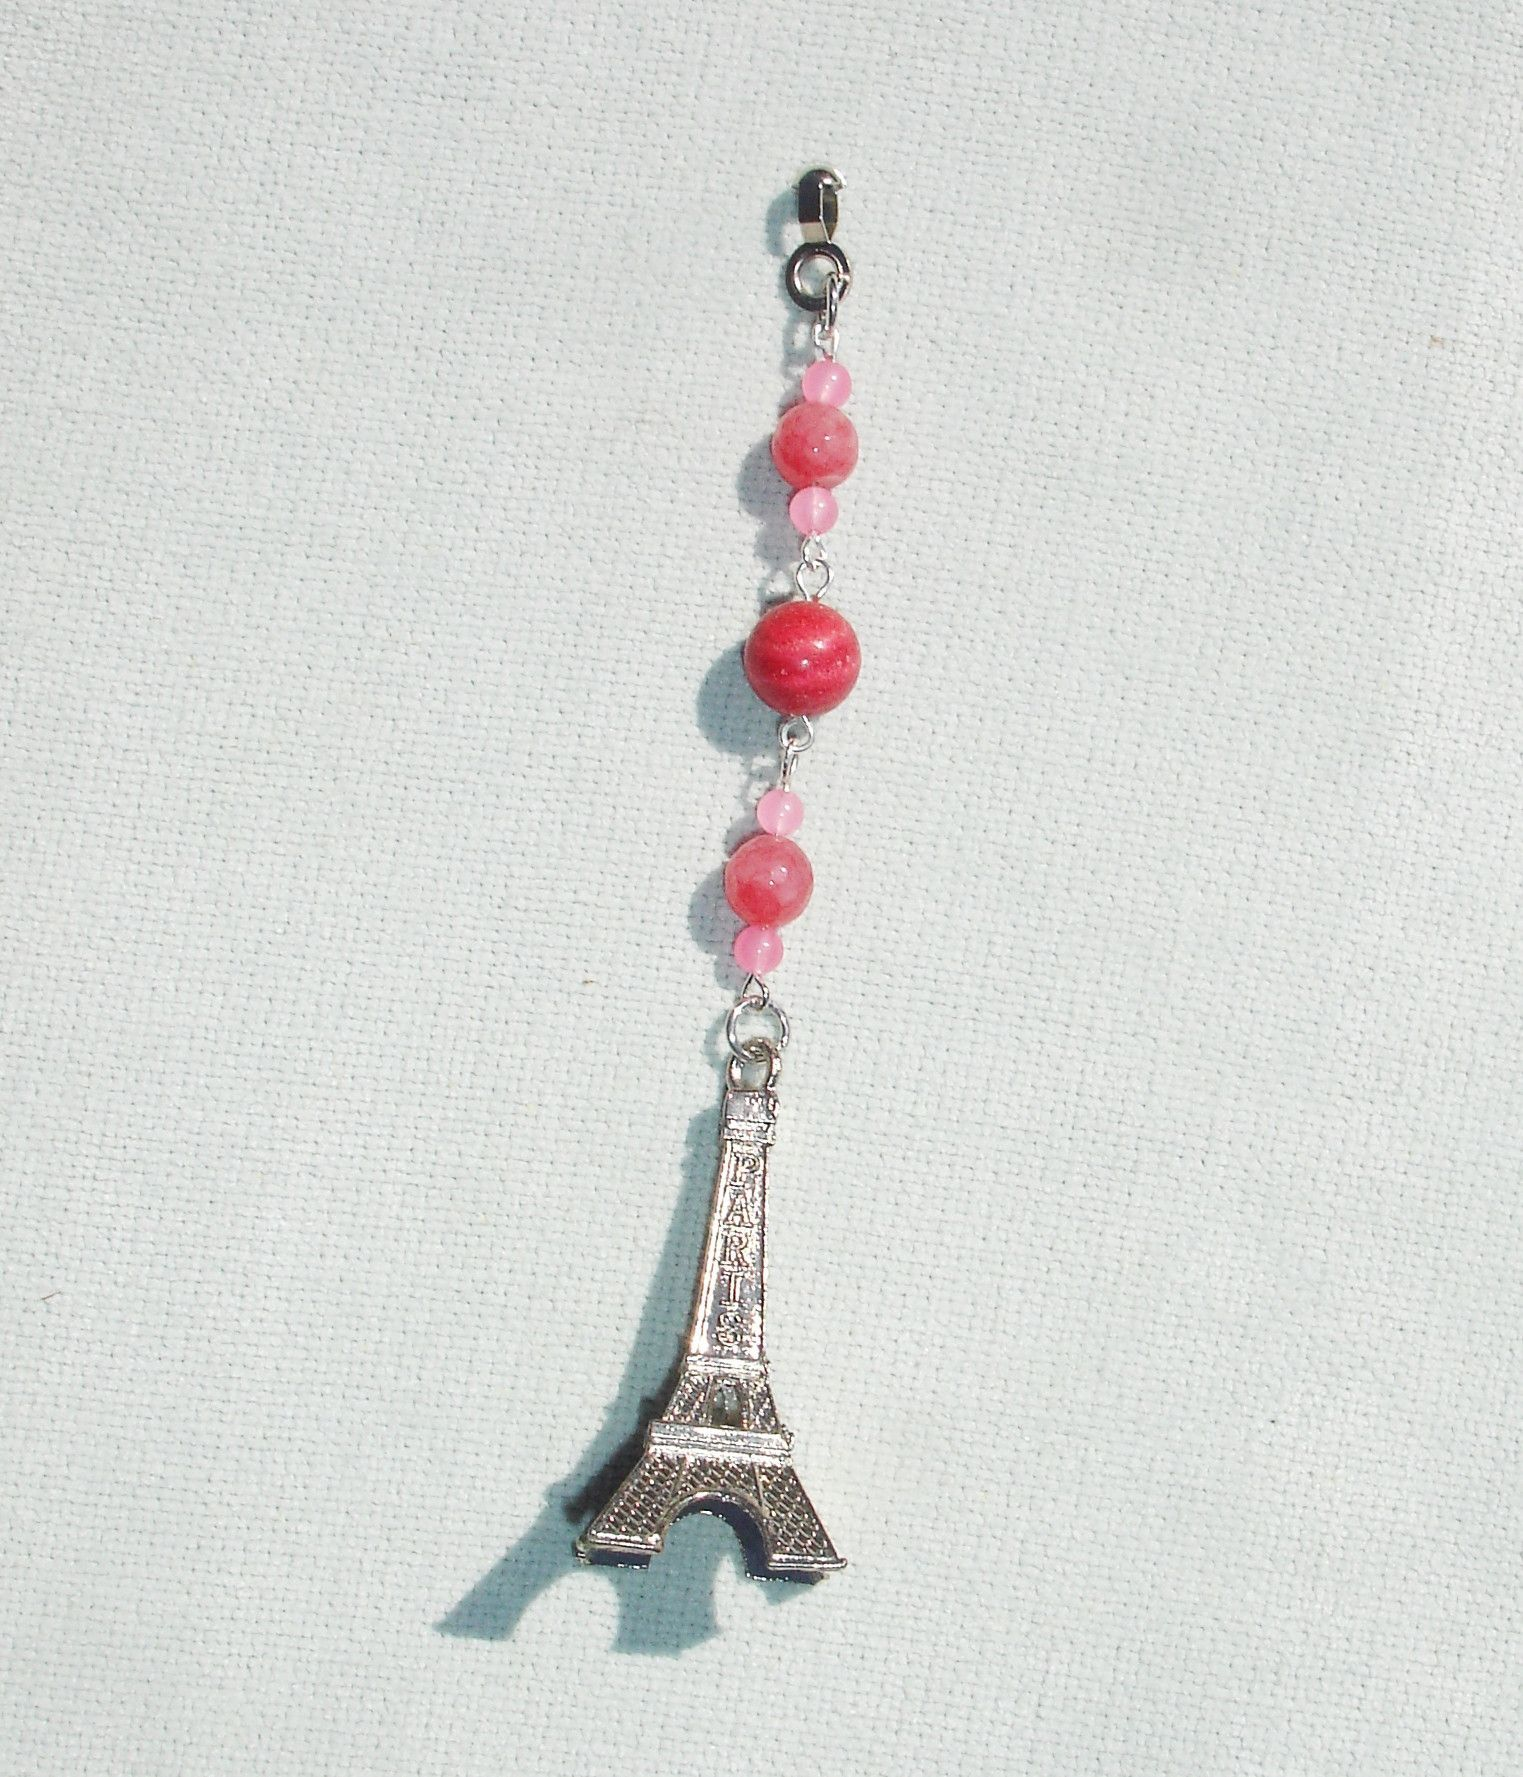 Handmade Eiffel Tower Gemstone Fan or Light Pull for Ceiling Fan or Chain Pull for Lamp